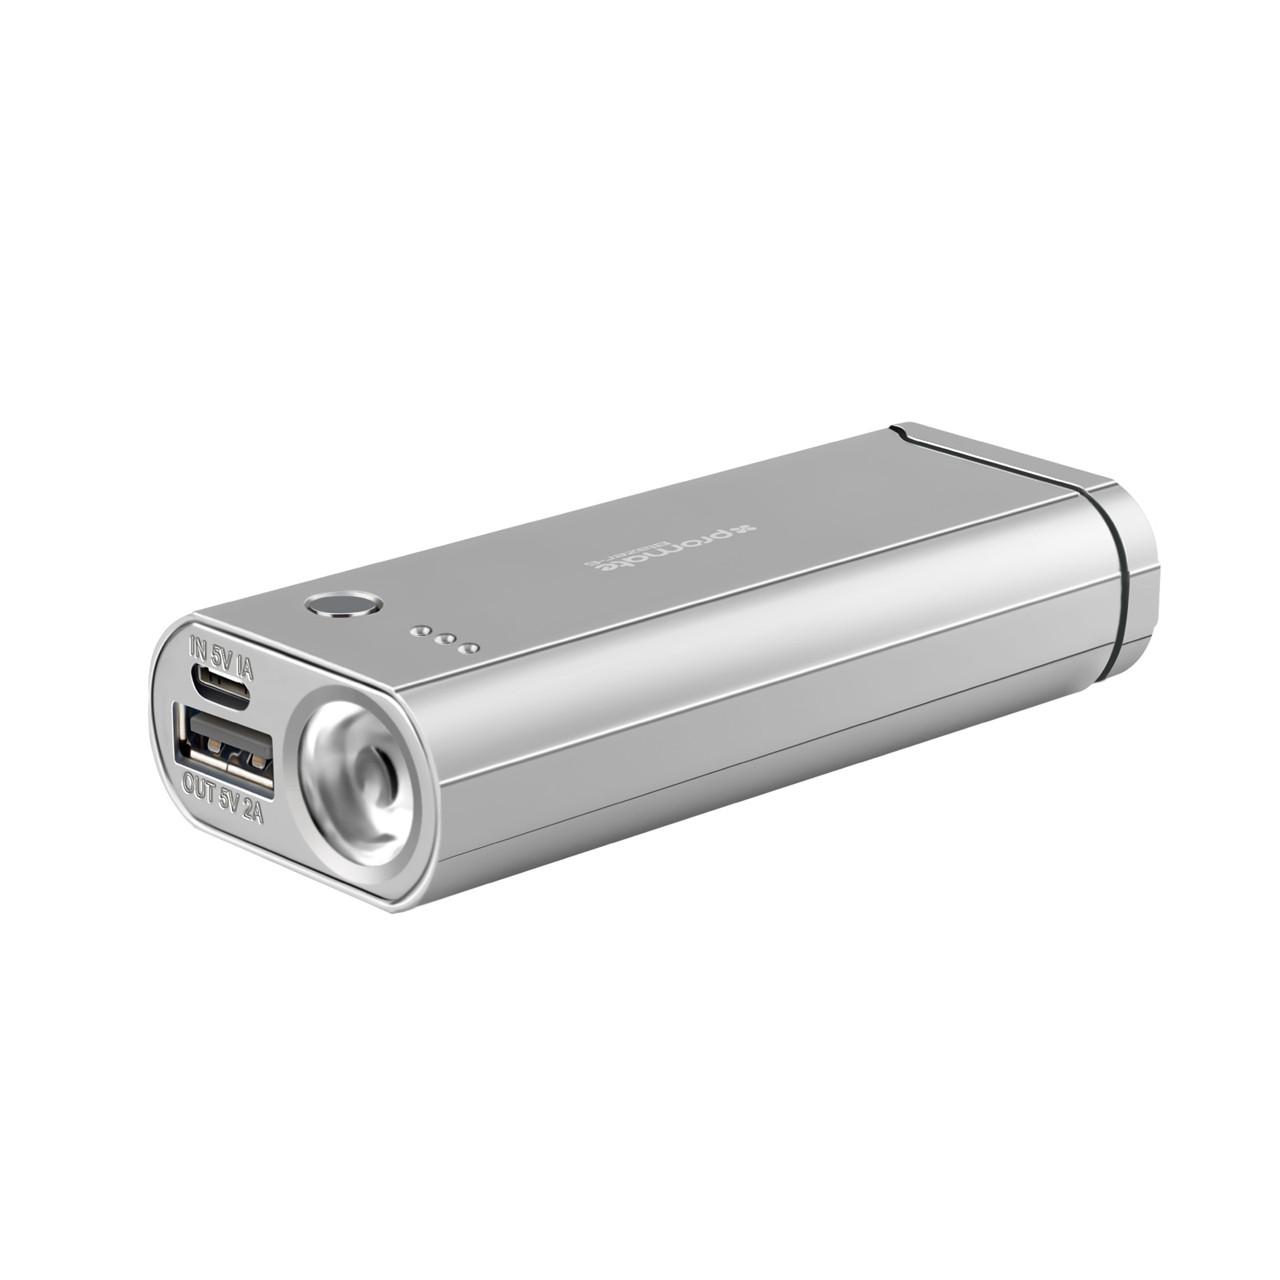 УМБ Promate Blazer-6 Silver